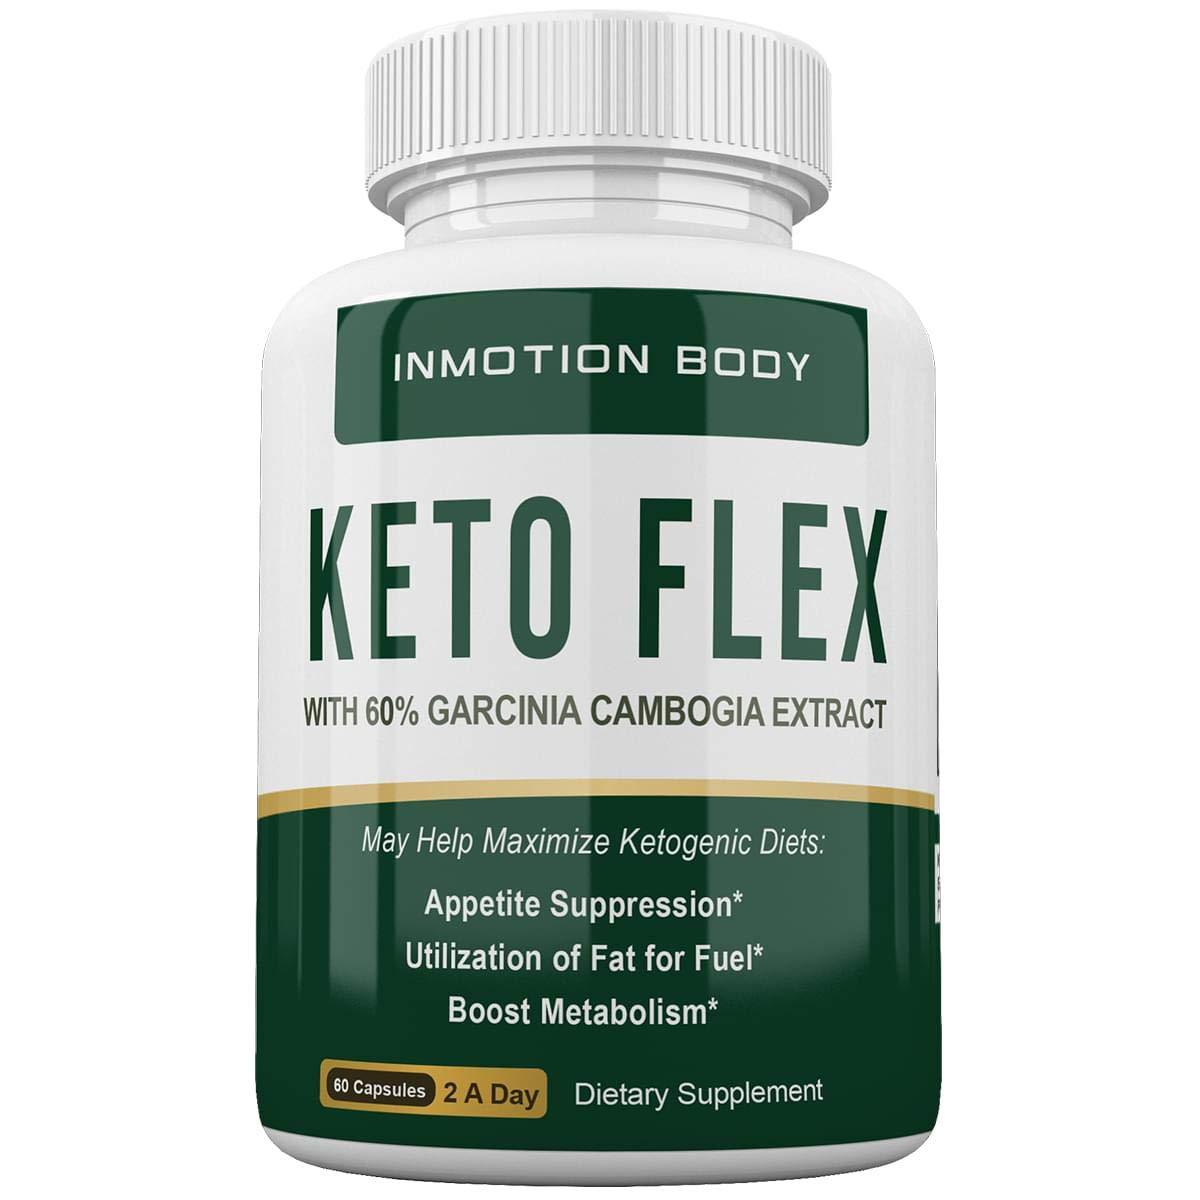 Keto Flex Weight Loss Pills W/Garcinia Cambogia Extract - 30 Day Supply